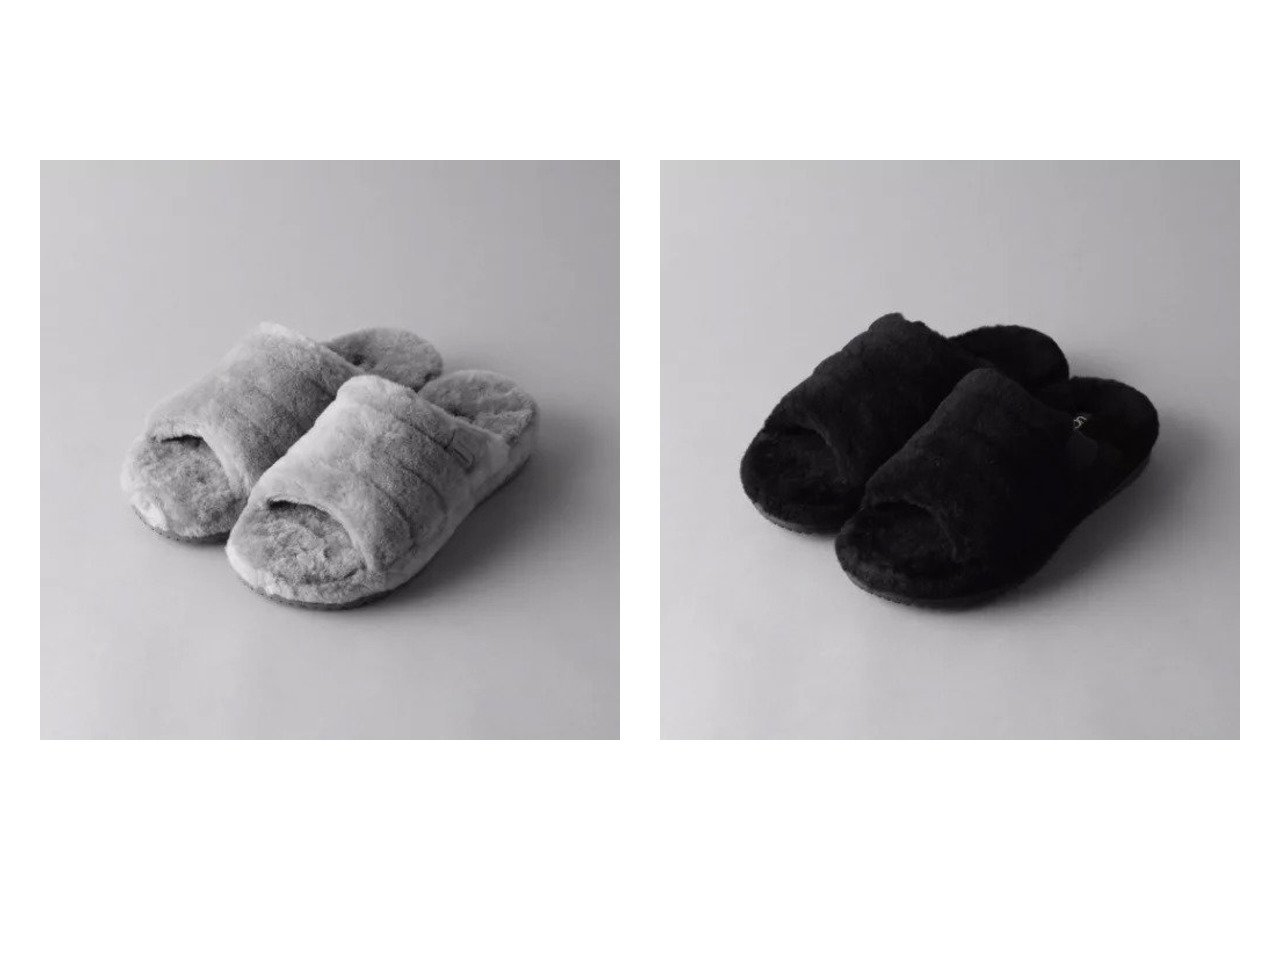 【Odette e Odile/オデット エ オディール】のUGG M FLUFF YOU 【シューズ・靴】おすすめ!人気、トレンド・レディースファッションの通販  おすすめで人気の流行・トレンド、ファッションの通販商品 メンズファッション・キッズファッション・インテリア・家具・レディースファッション・服の通販 founy(ファニー) https://founy.com/ ファッション Fashion レディースファッション WOMEN インソール サンダル シューズ シンプル スタイリッシュ スリッパ リラックス |ID:crp329100000032117